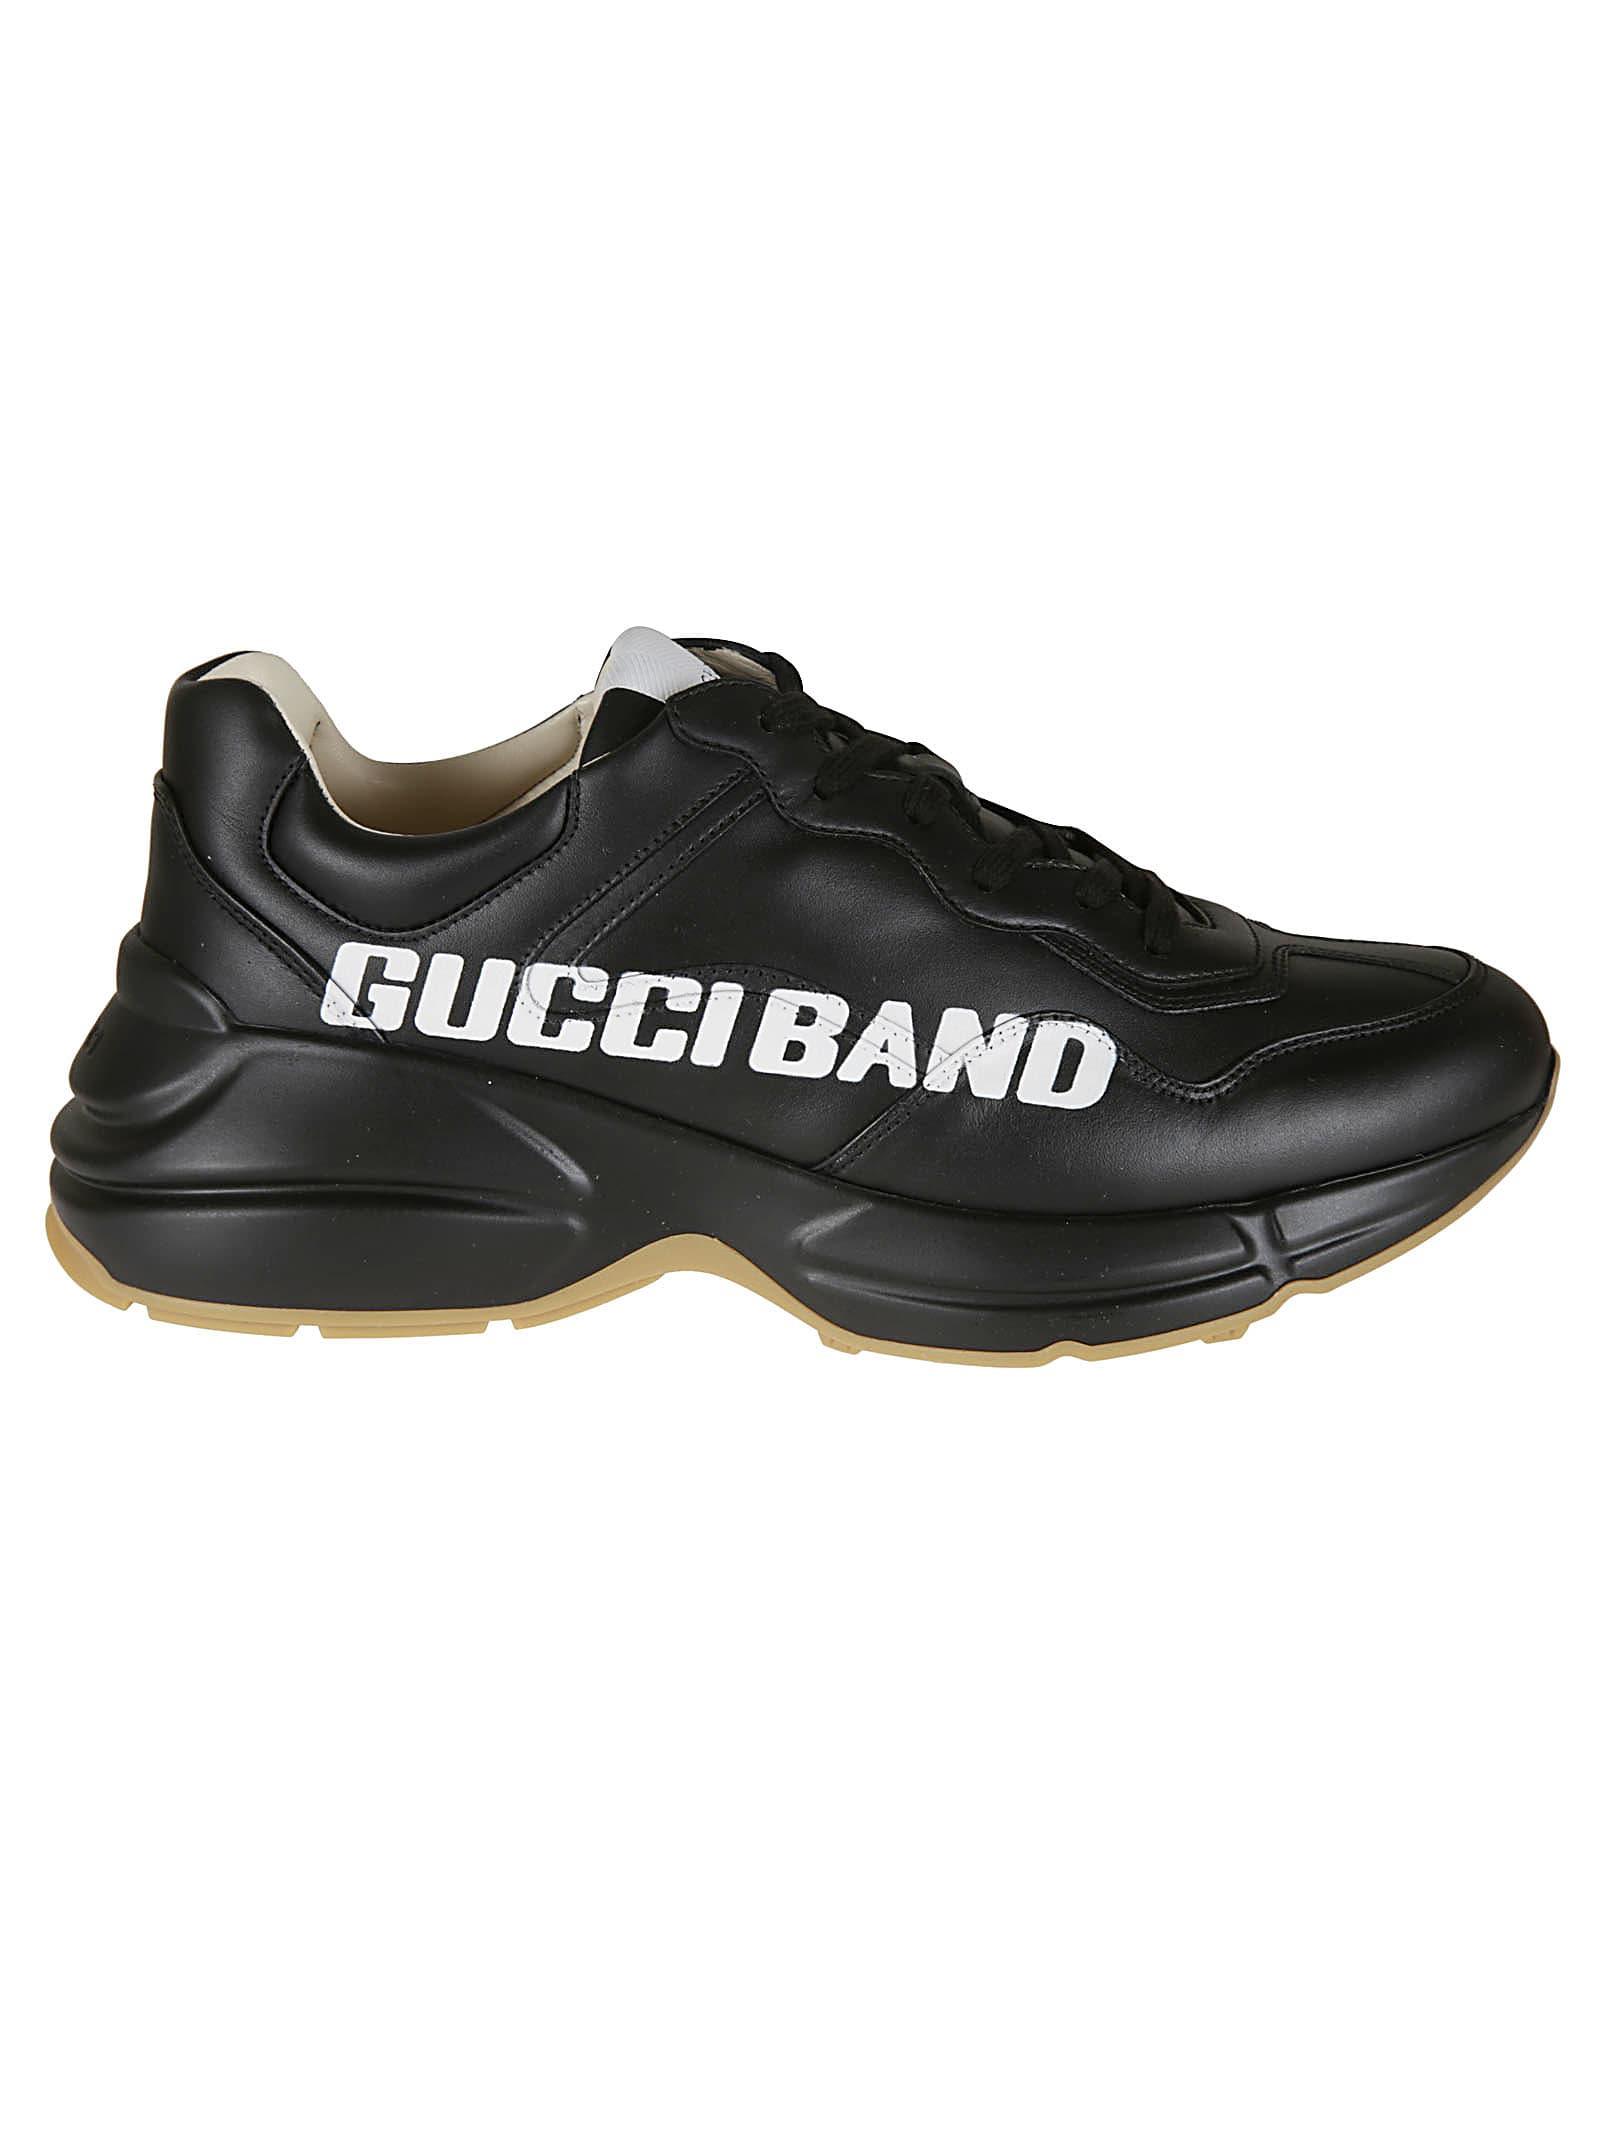 Gucci Logo Printed Sneakers